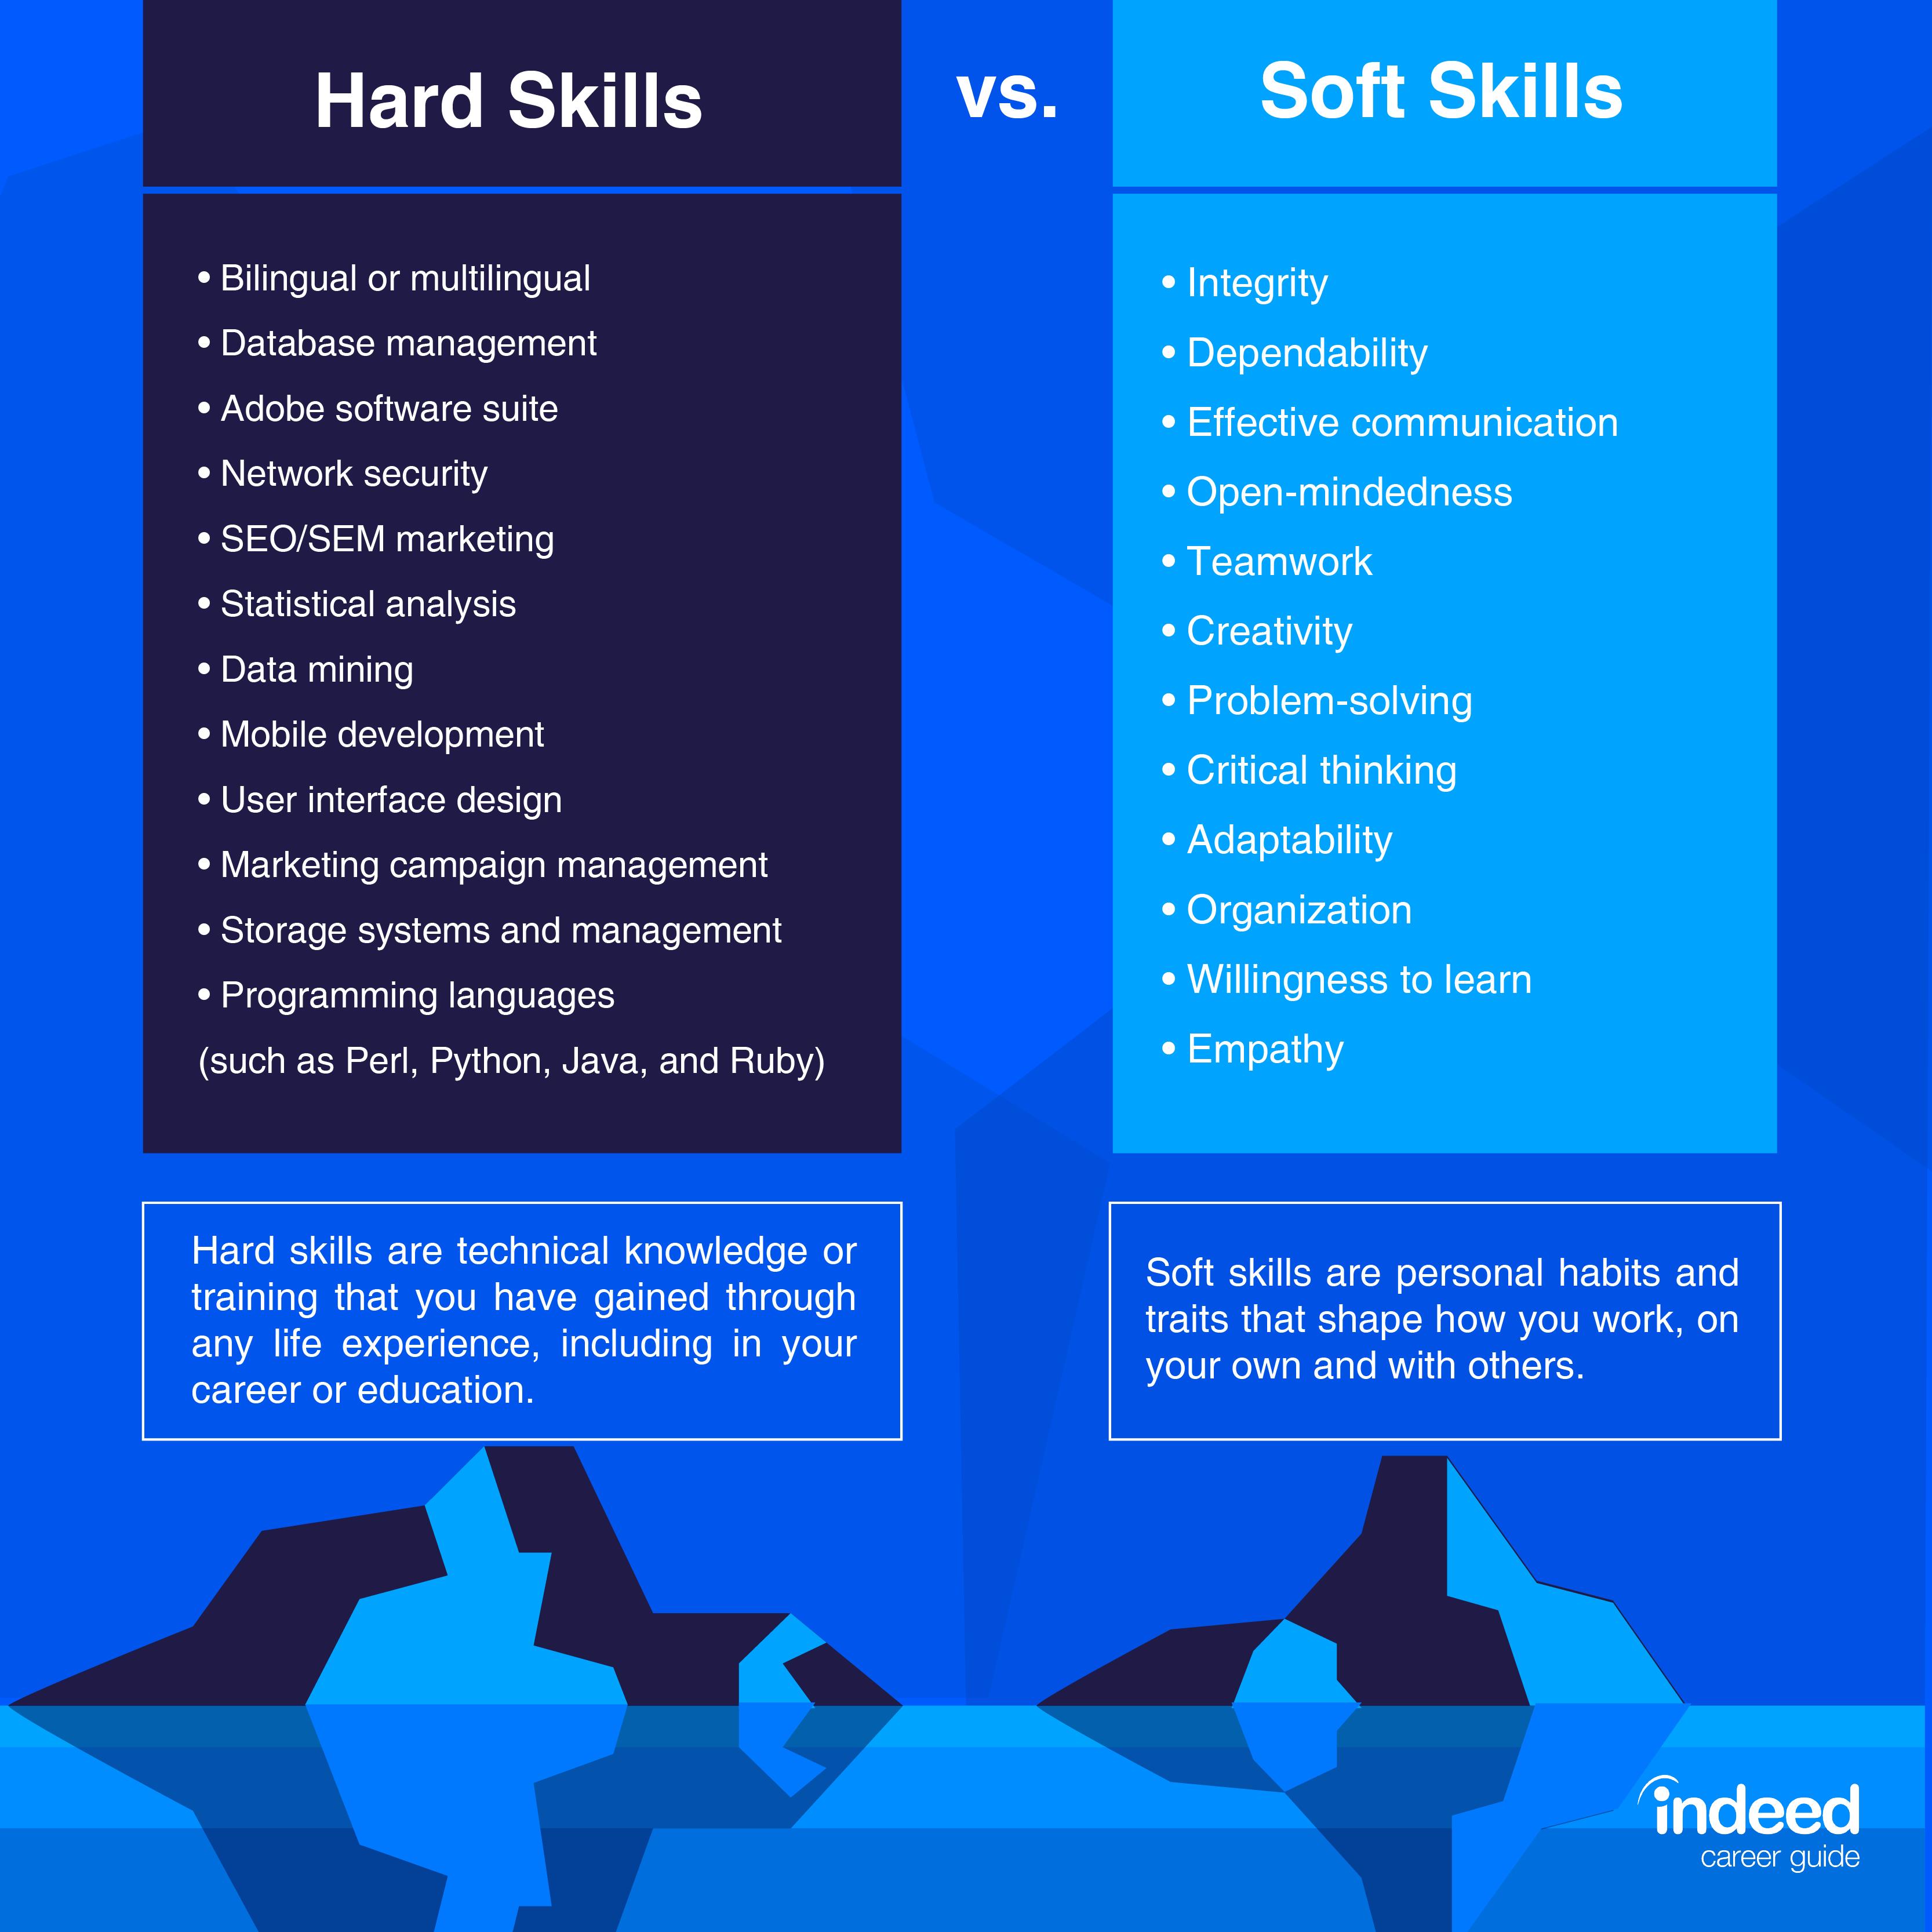 Hard Skills vs. Soft Skills in 2020